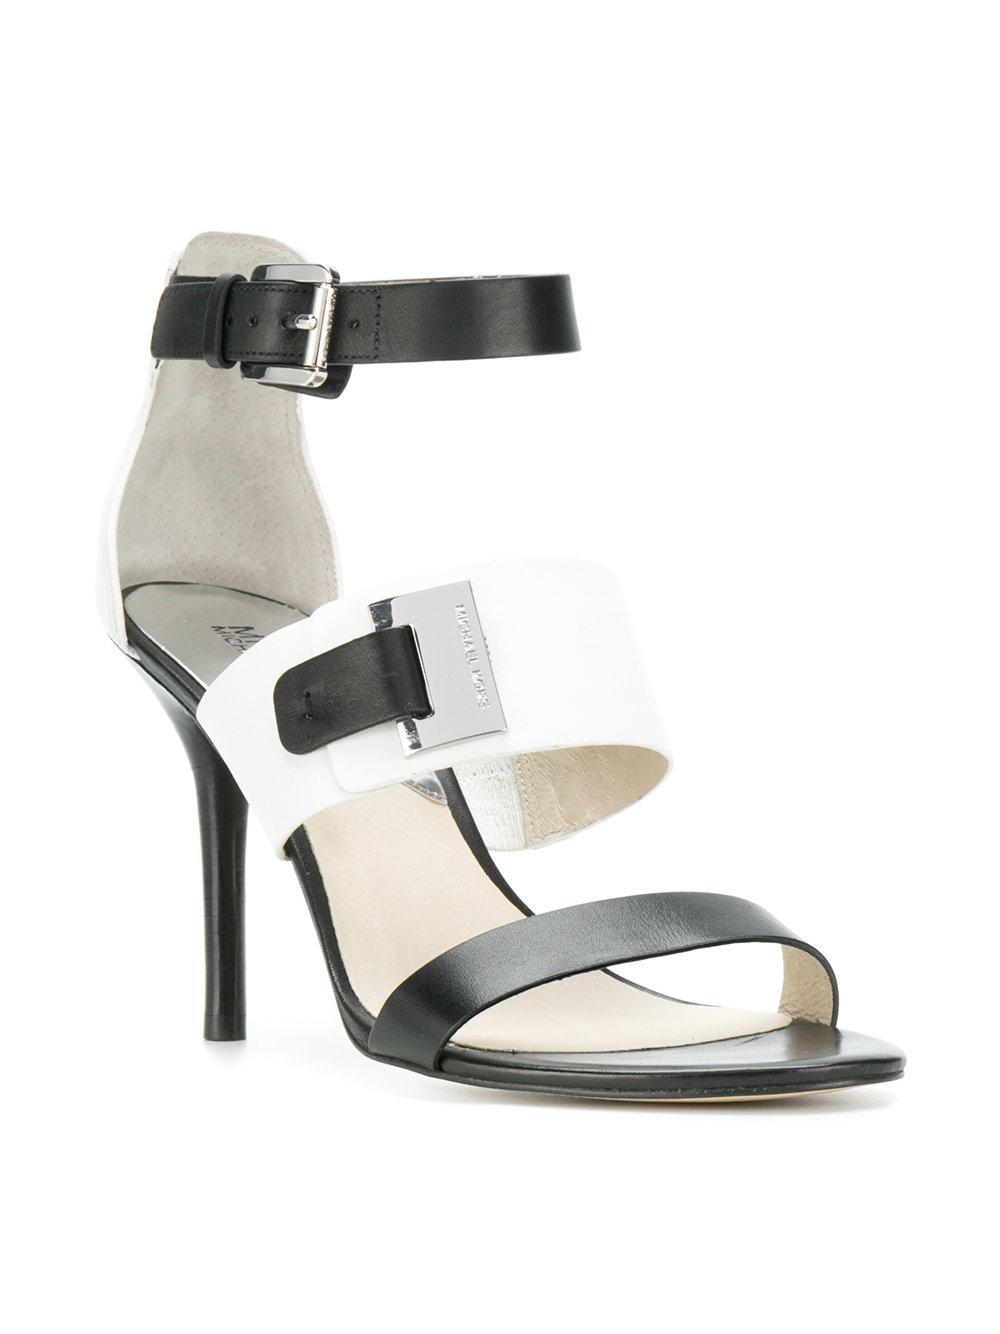 2804ec2a0e3 MICHAEL Michael Kors - Black Two-tone Strappy Sandals - Lyst. View  fullscreen